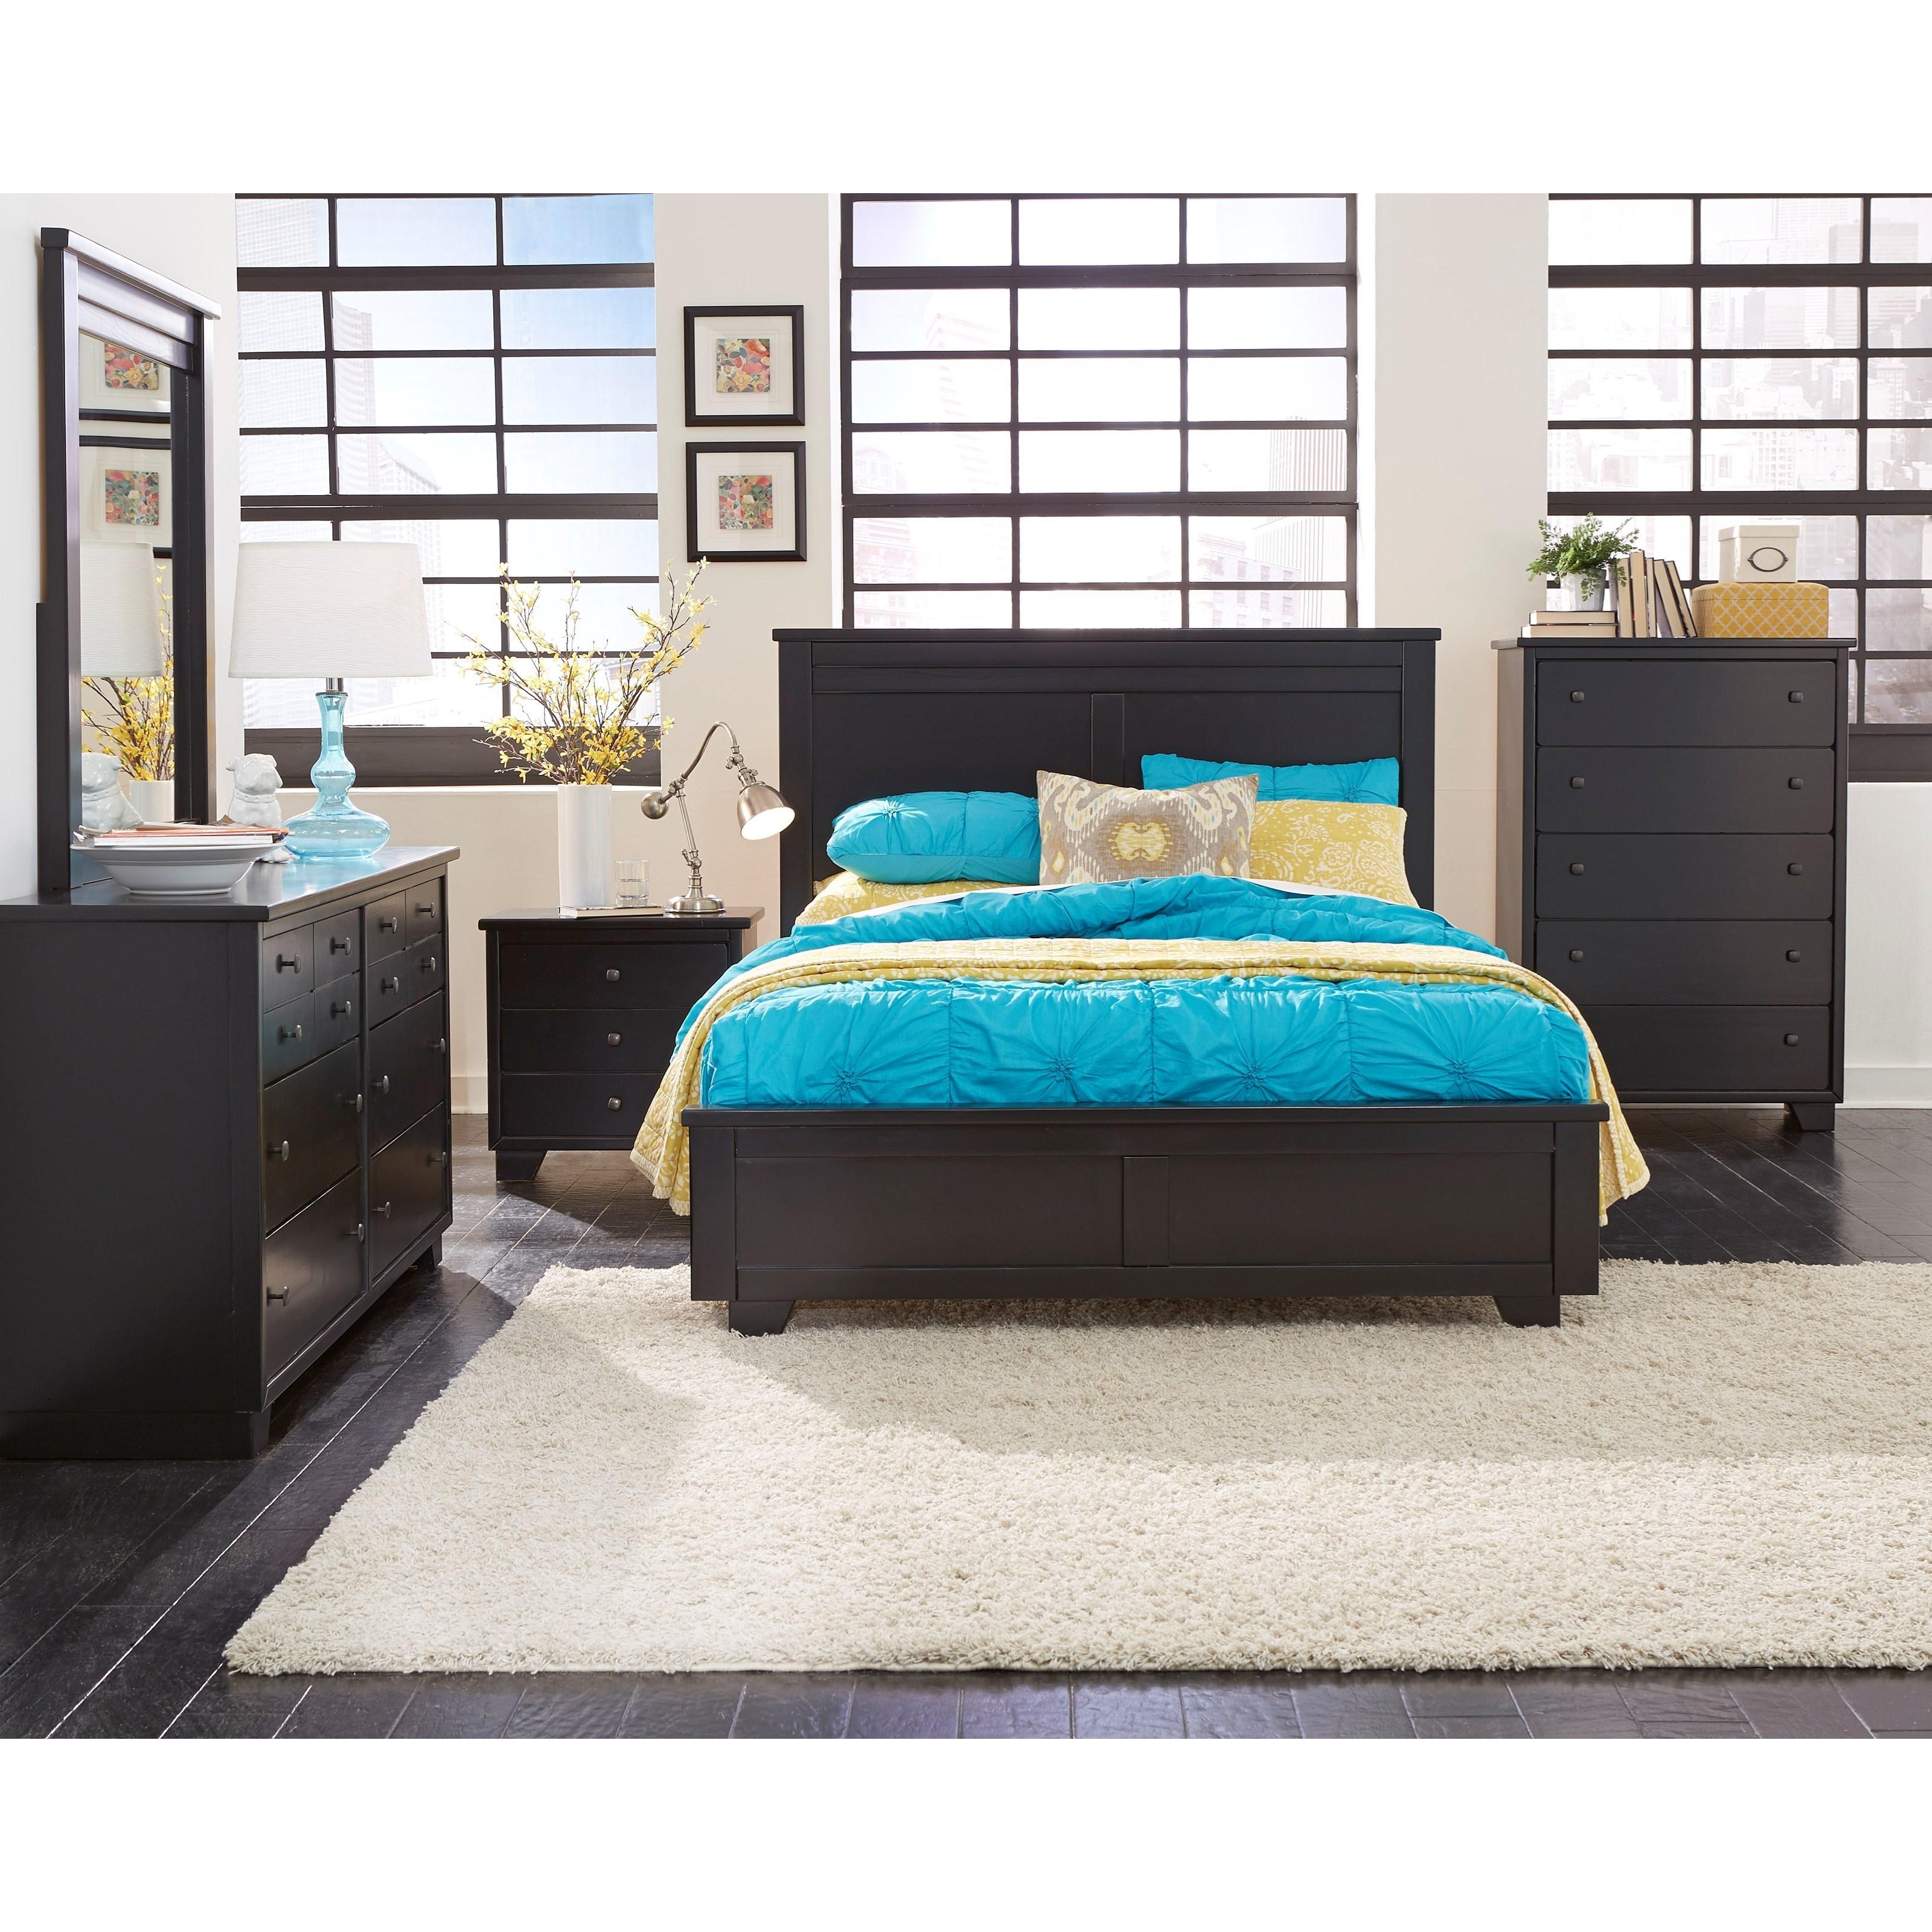 Progressive Furniture Diego Full Bedroom Group - Item Number: P619 F Bedroom Group 1